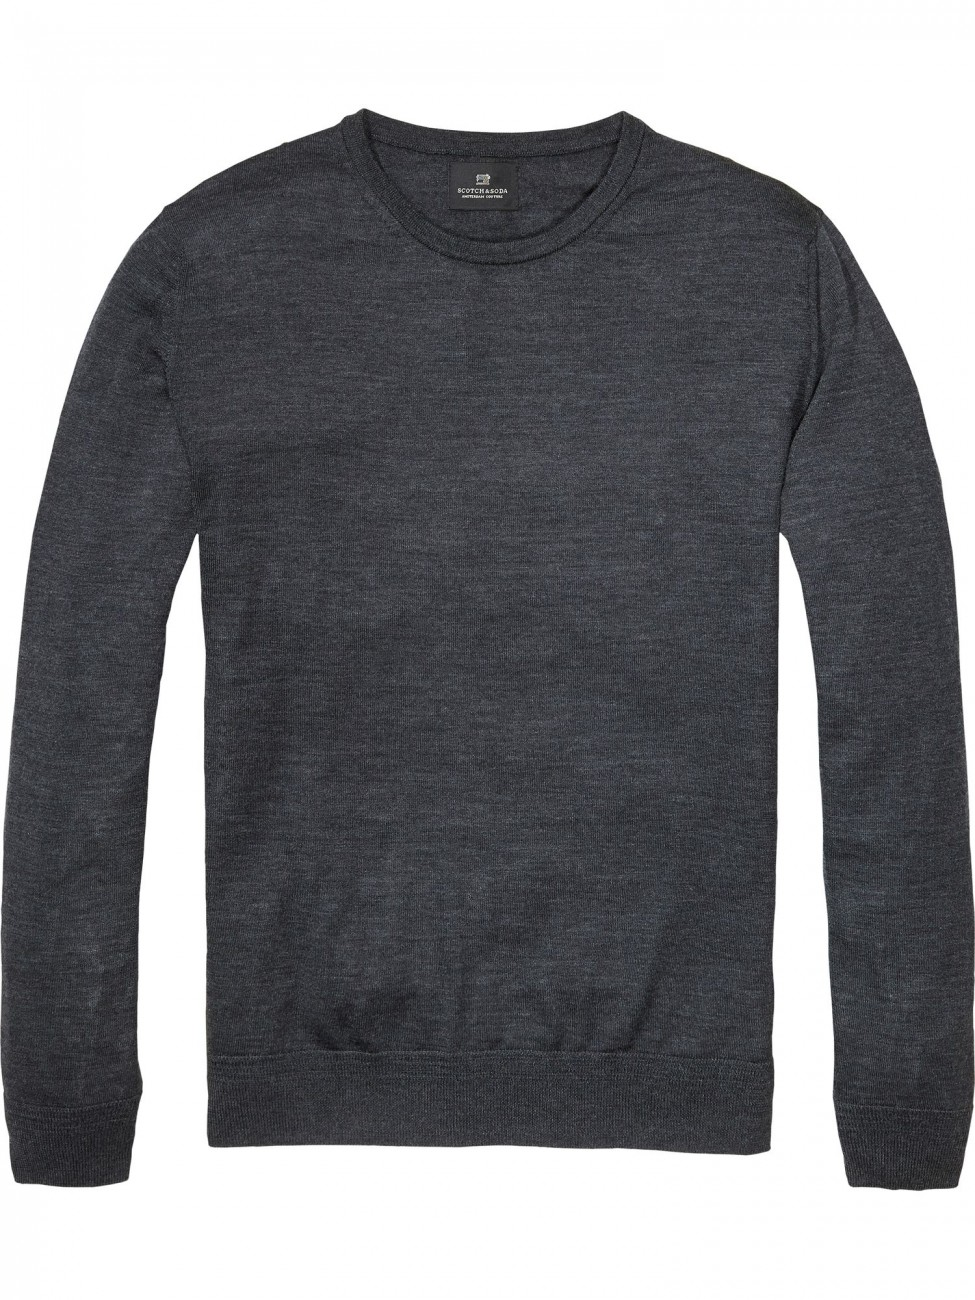 scotch soda herren classic merino pullover kaufen jeans direct de. Black Bedroom Furniture Sets. Home Design Ideas